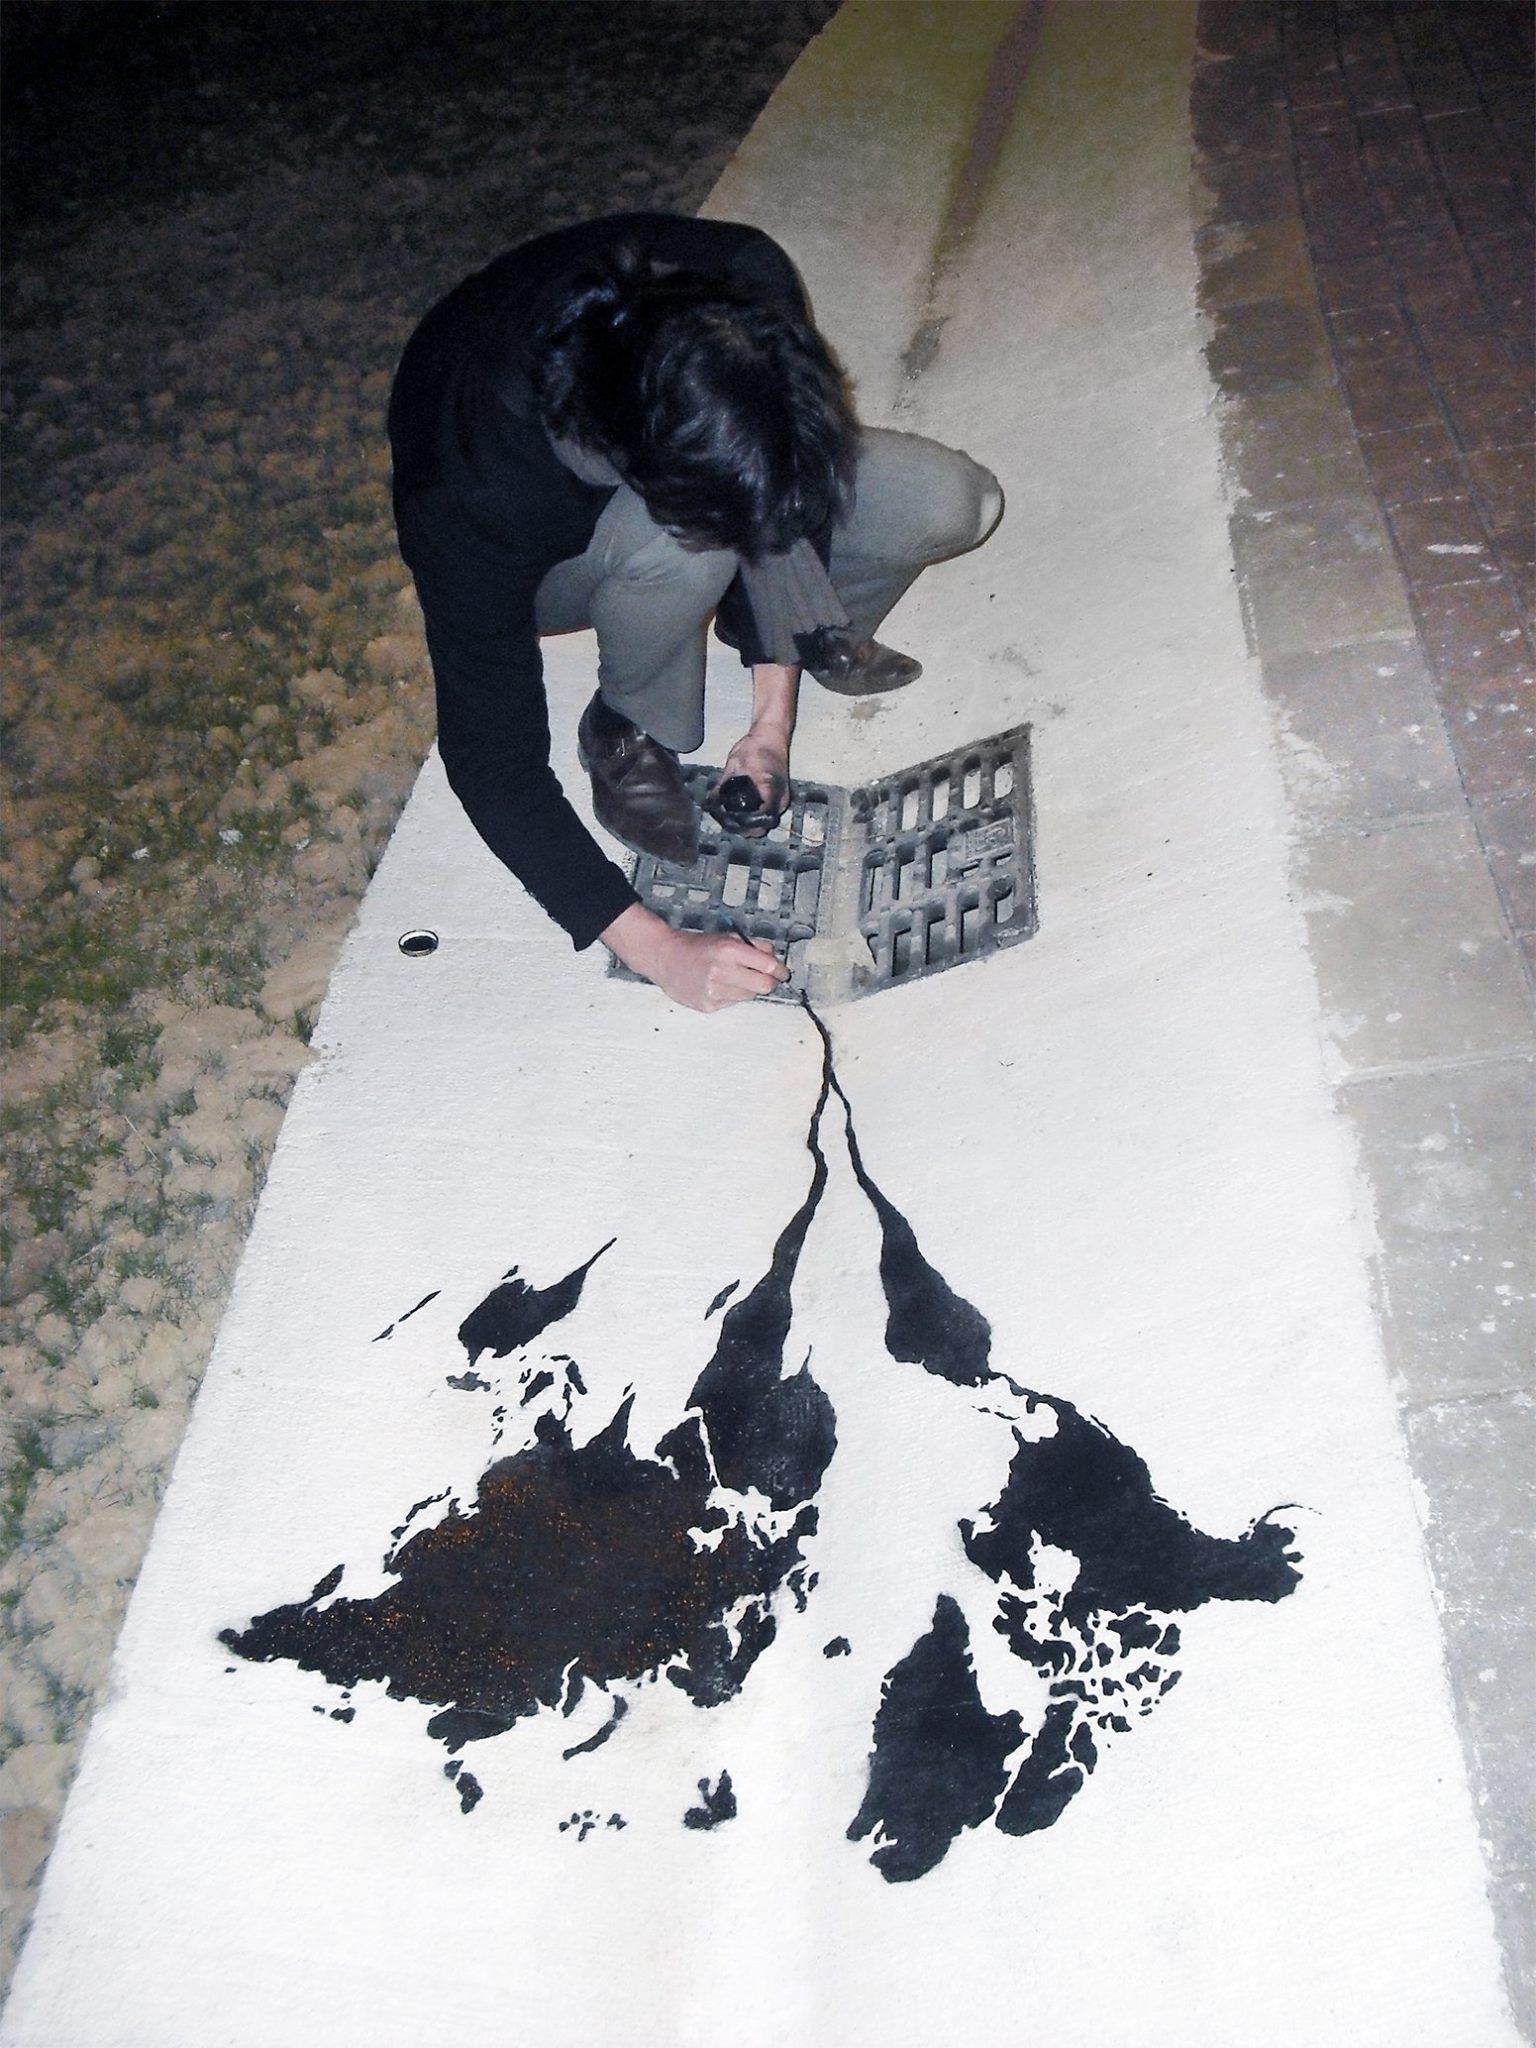 Creative-street-art-pejac-9